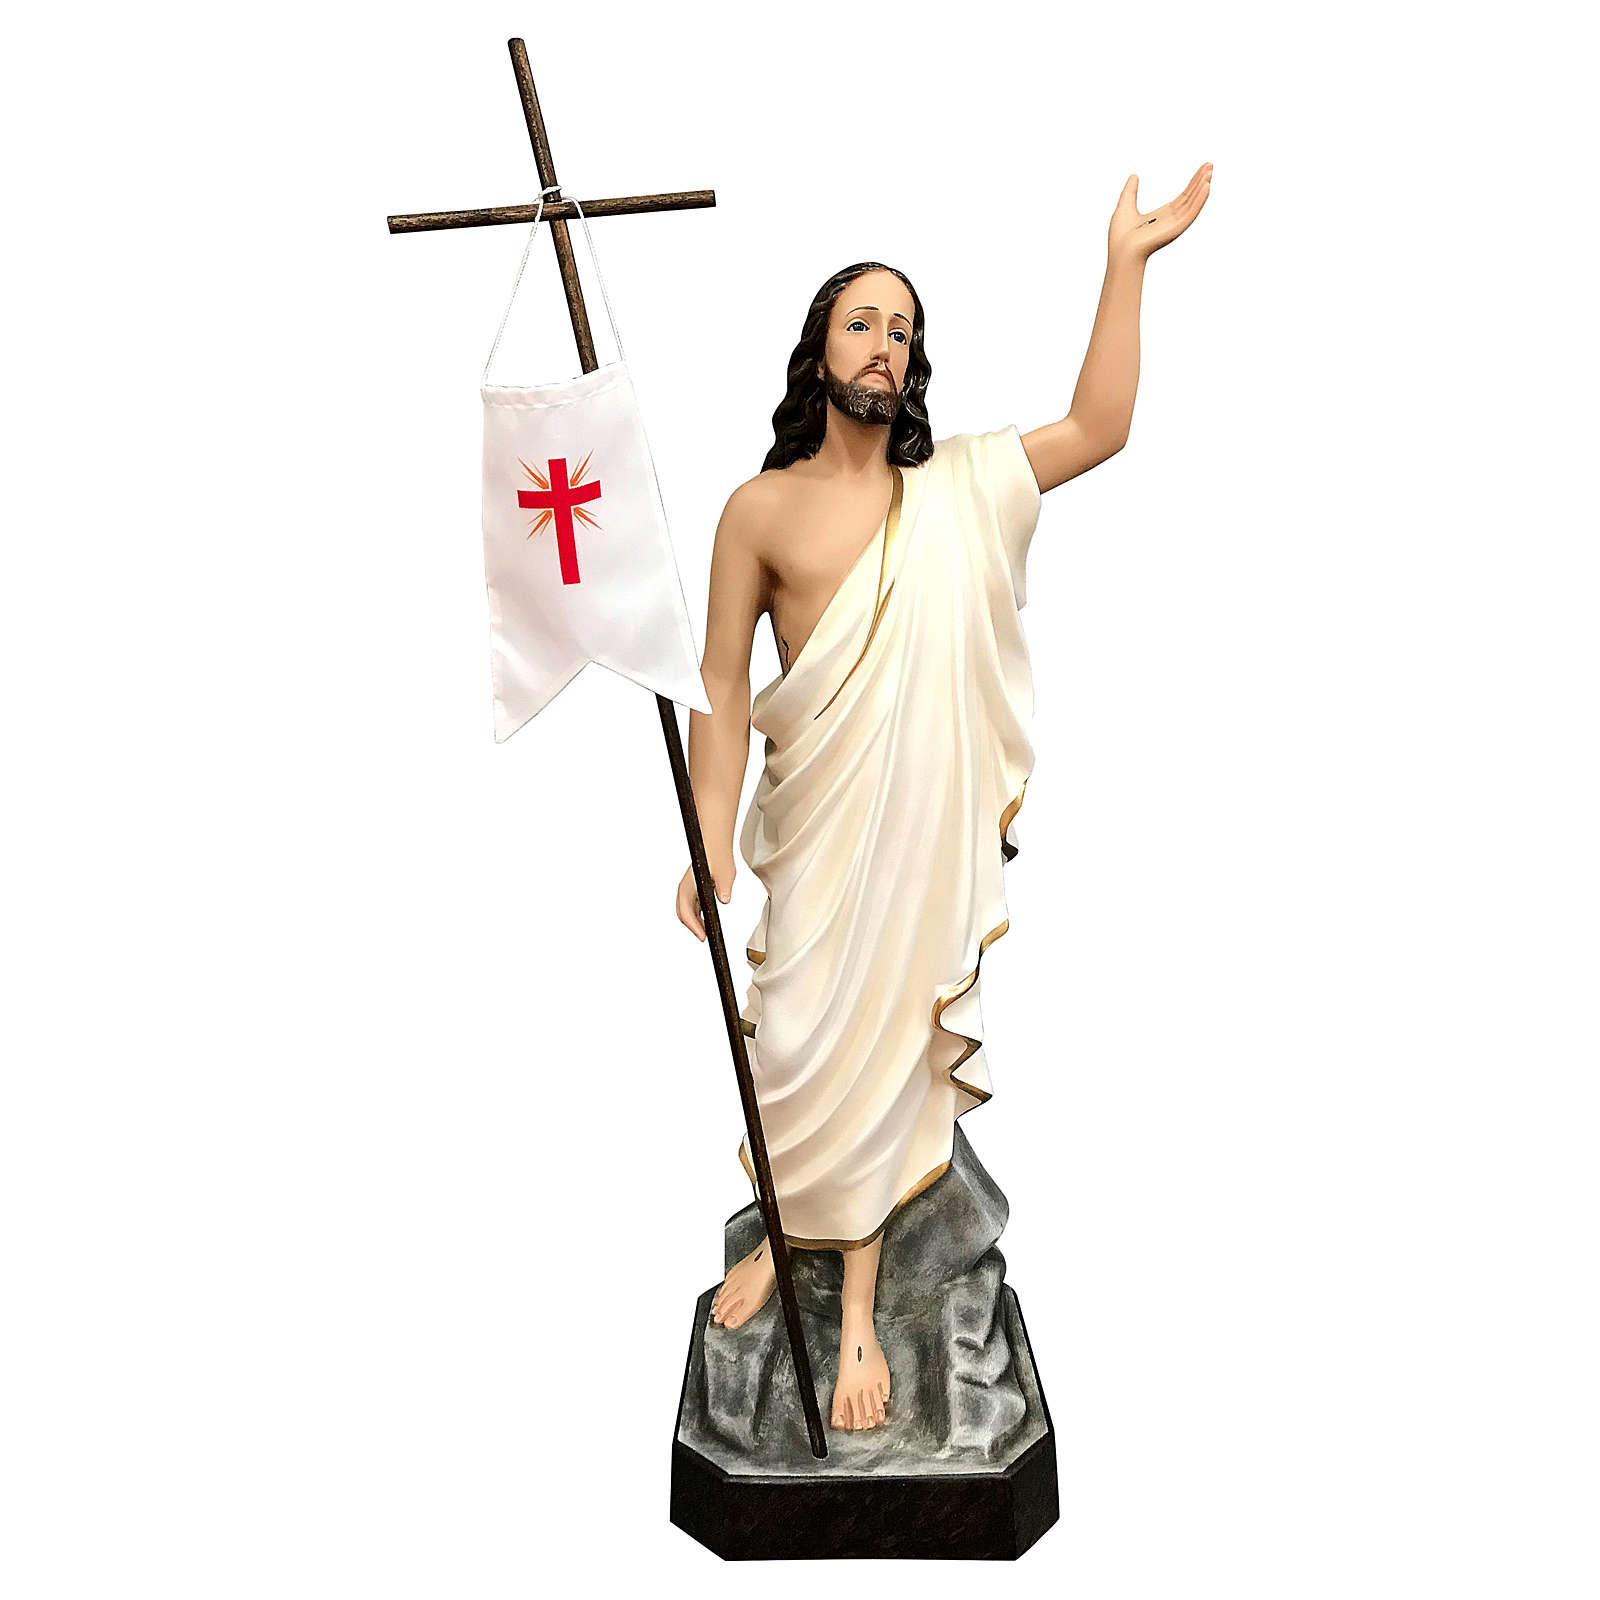 Statua Cristo risorto vetroresina 85 cm dipinta occhi vetro 4